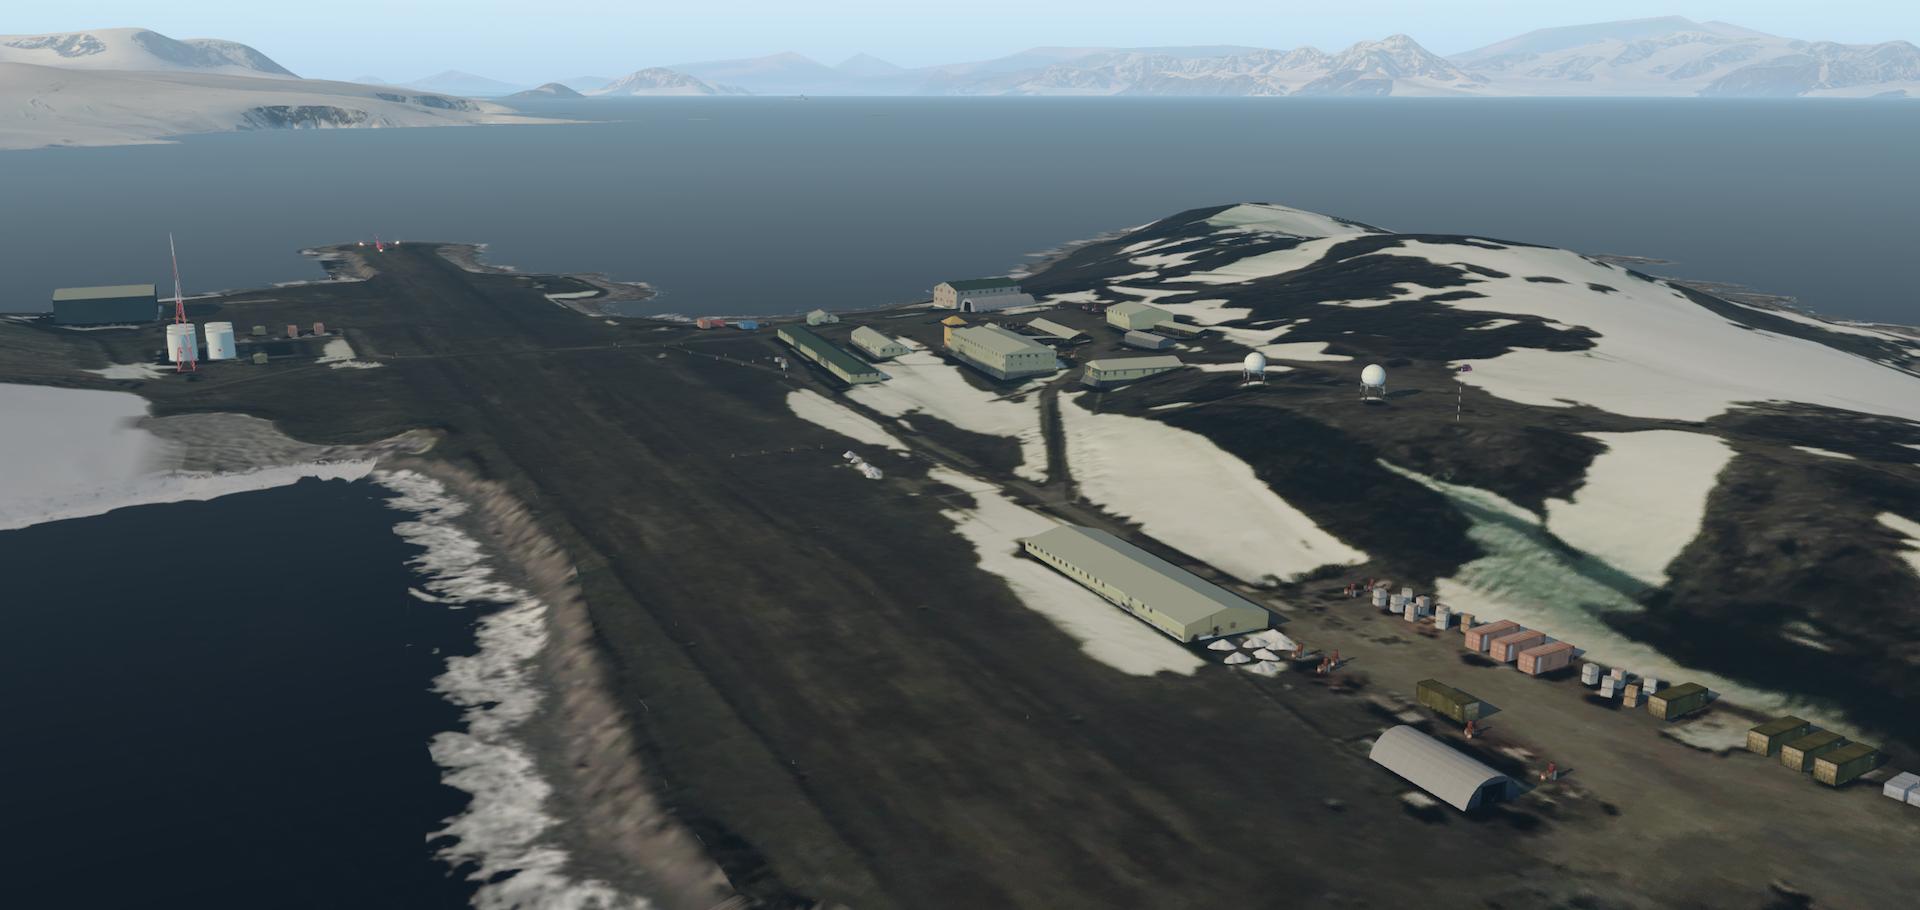 maps2xplane_feature_a4xp_scenery_v2_egar